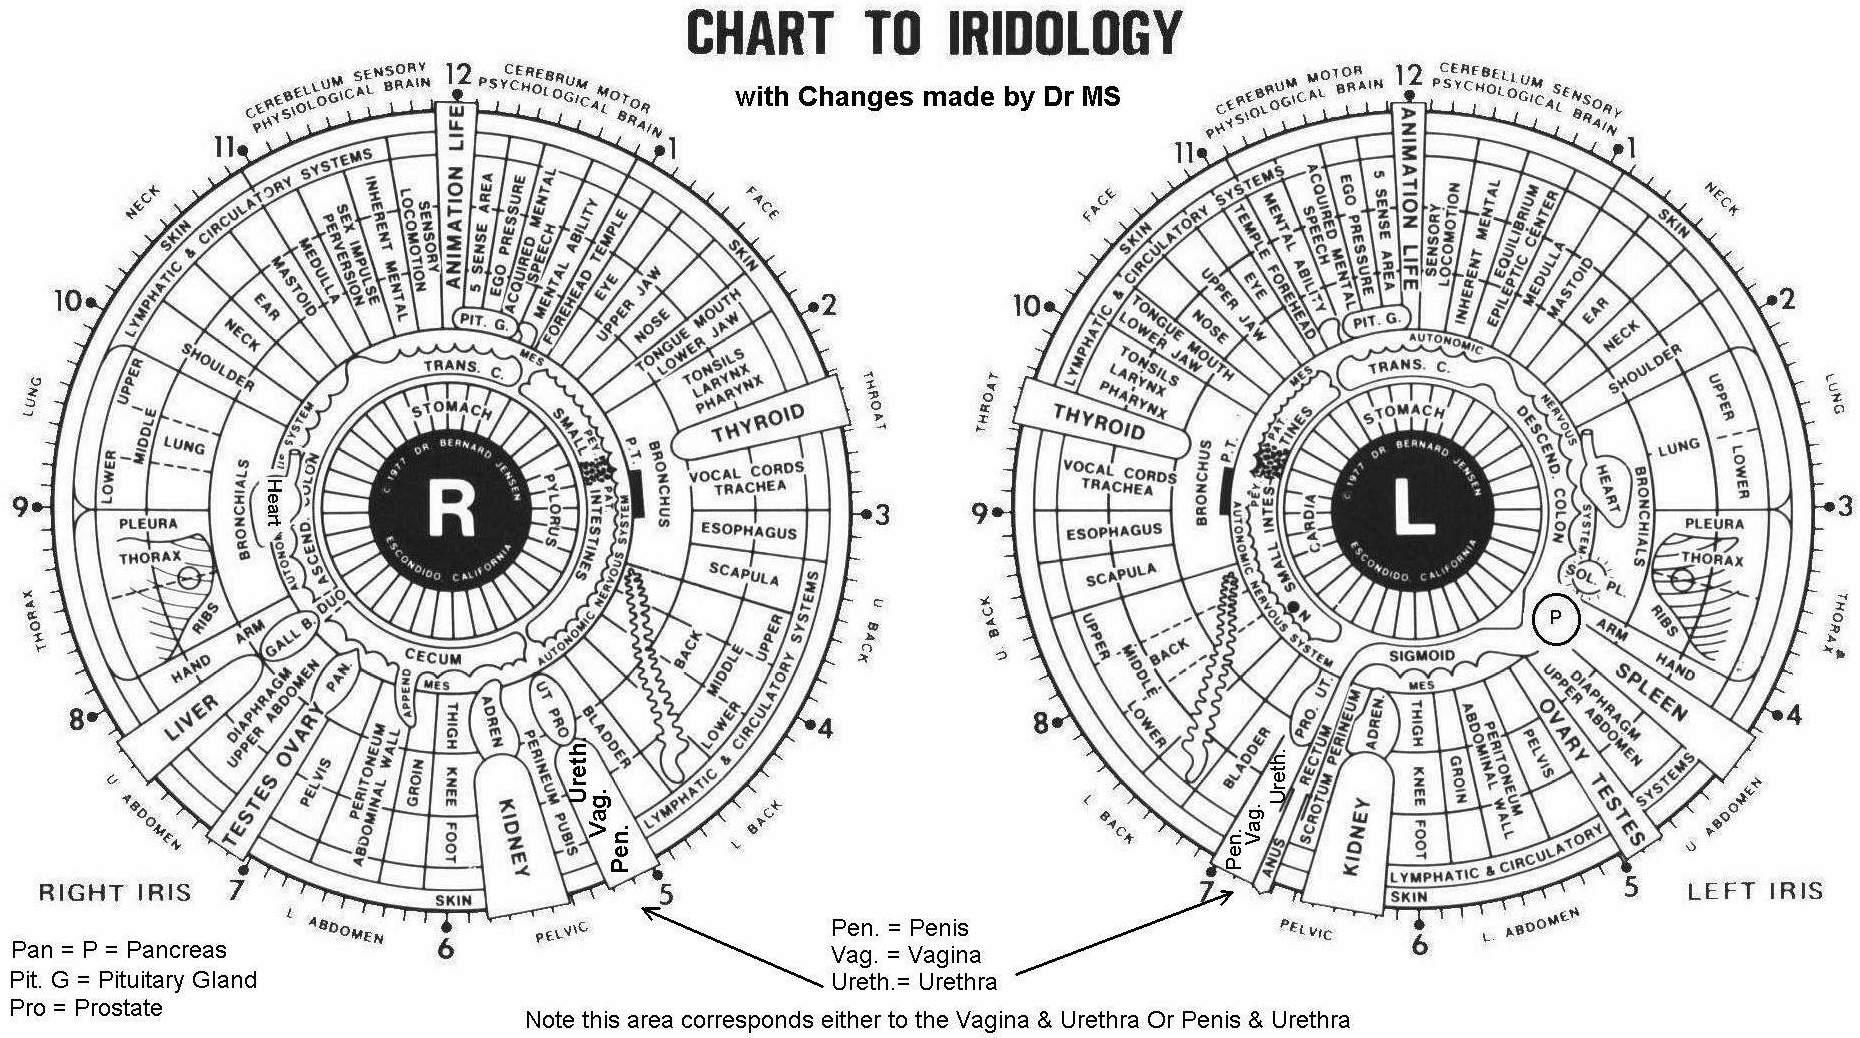 Iridology chart revised updated 19 feb 2006 geenschuldenfo Gallery